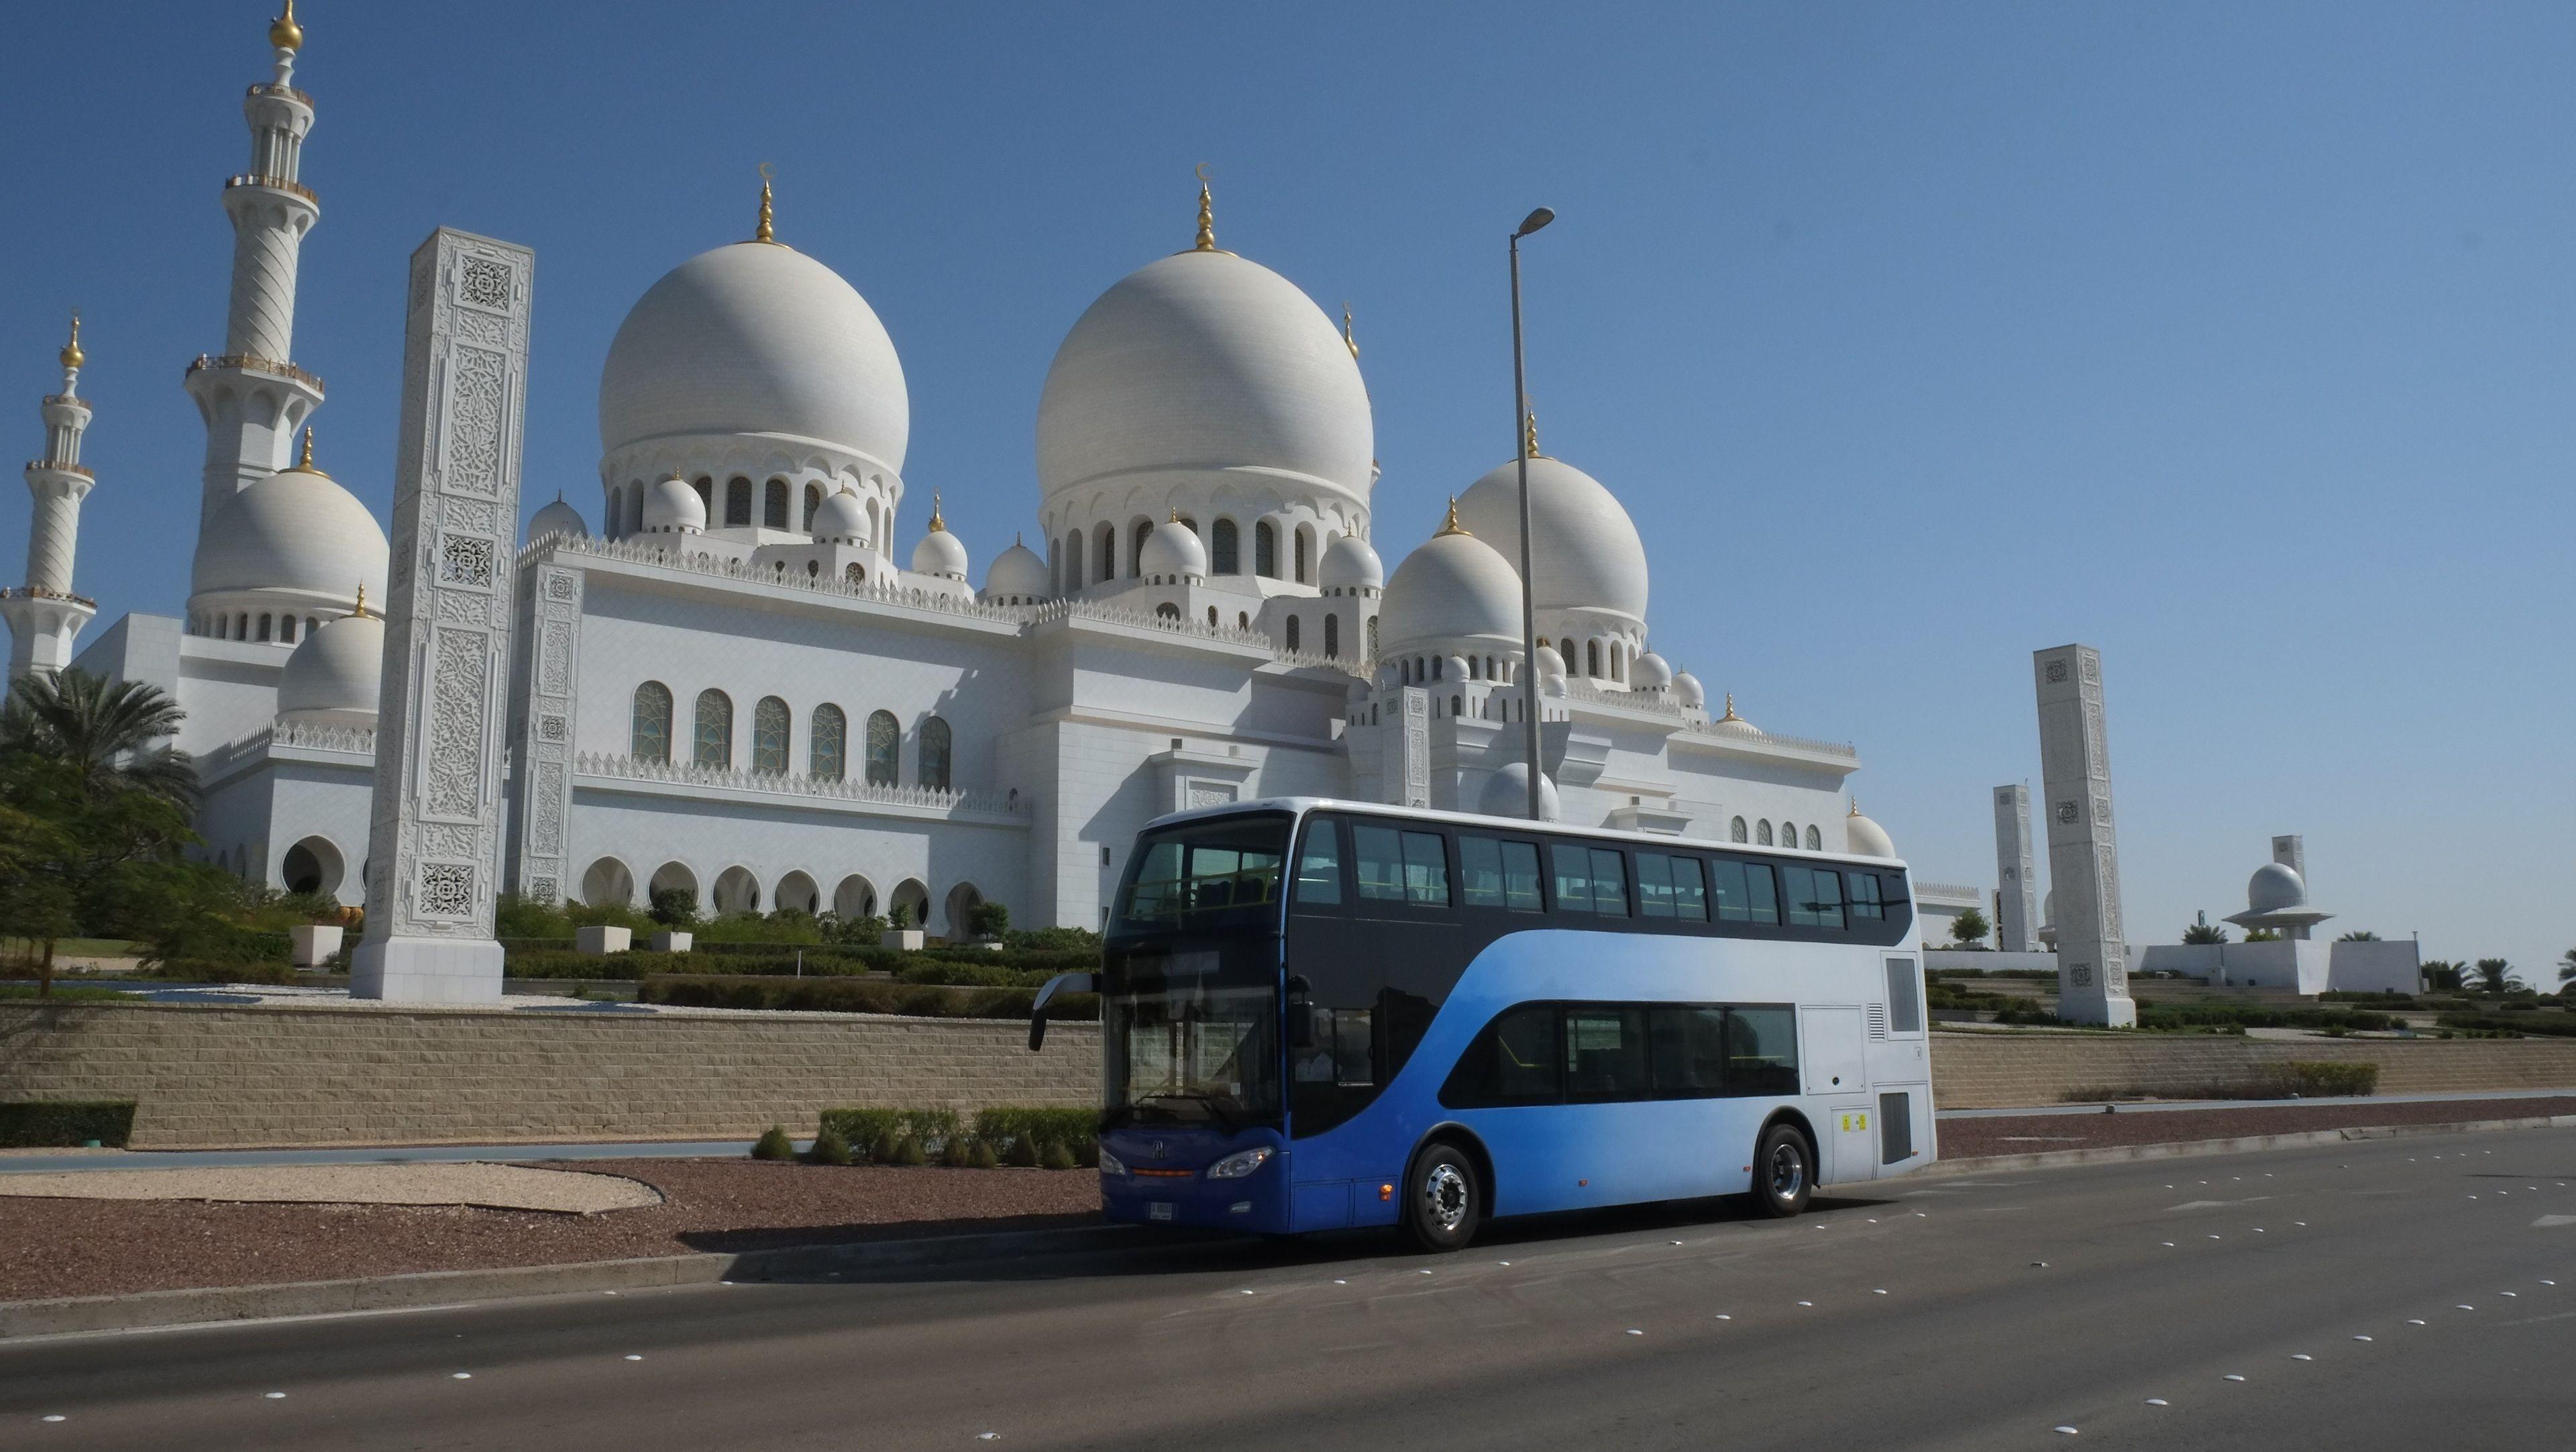 Abu Dhabi City Tour in a Double Decker Bus from Dubai